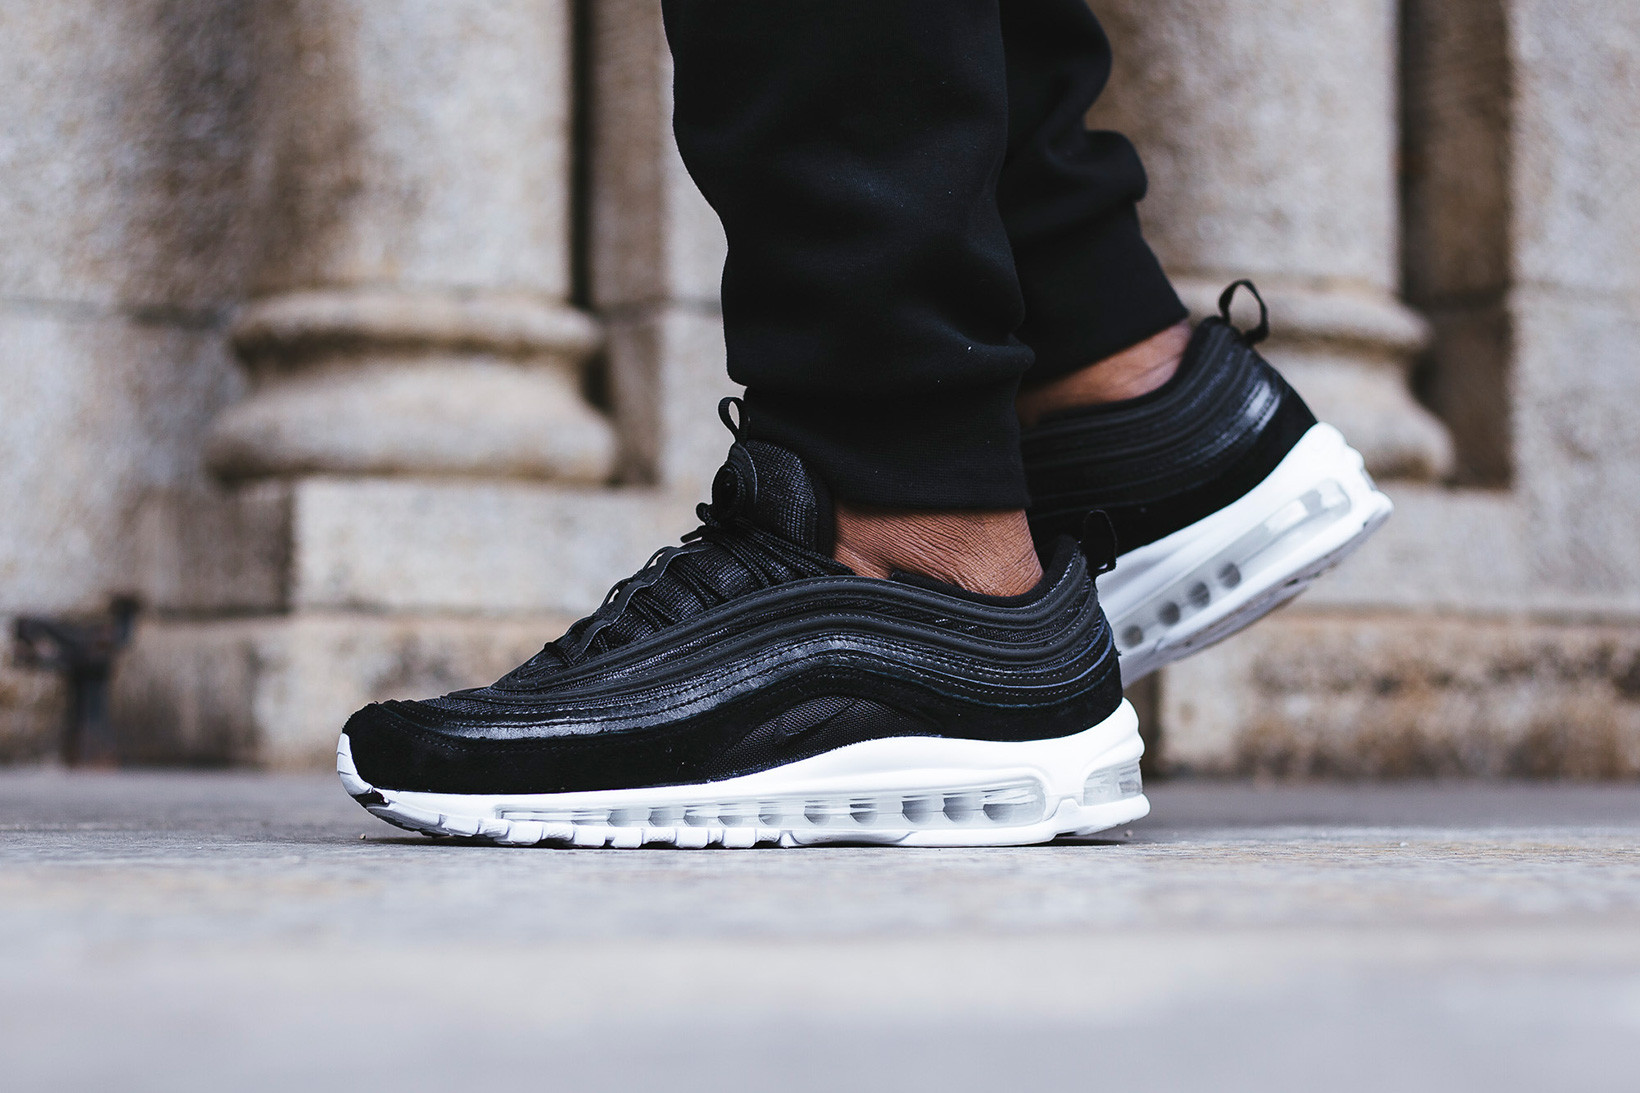 Nike Air Max 97 Navy, Black, \u0026 Grey On Feet Look